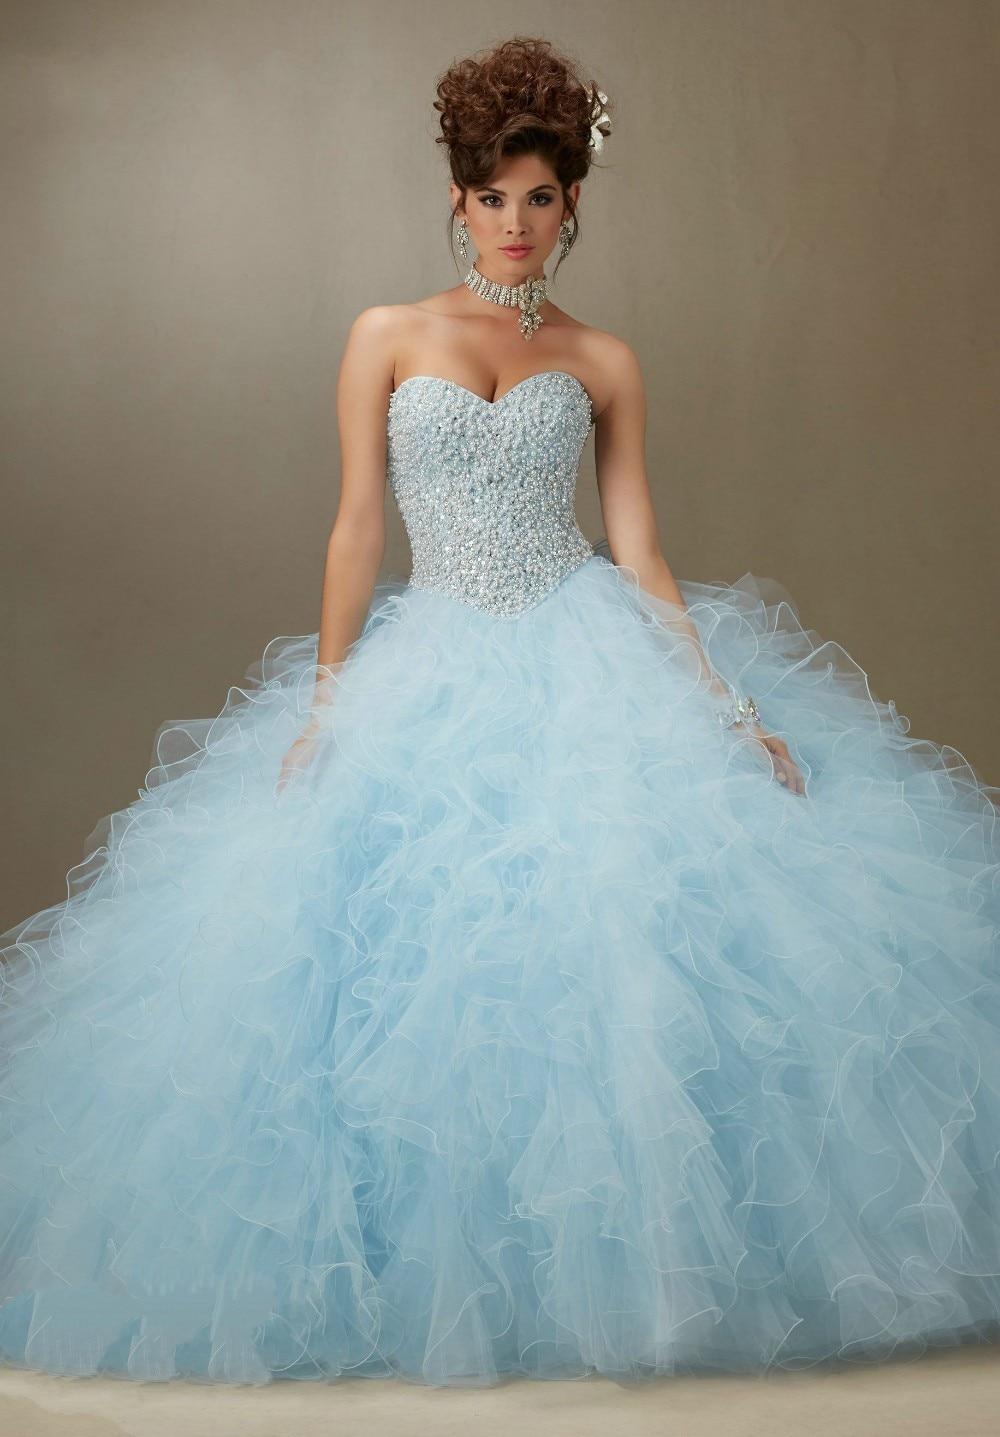 Baby Blue 15 Dresses